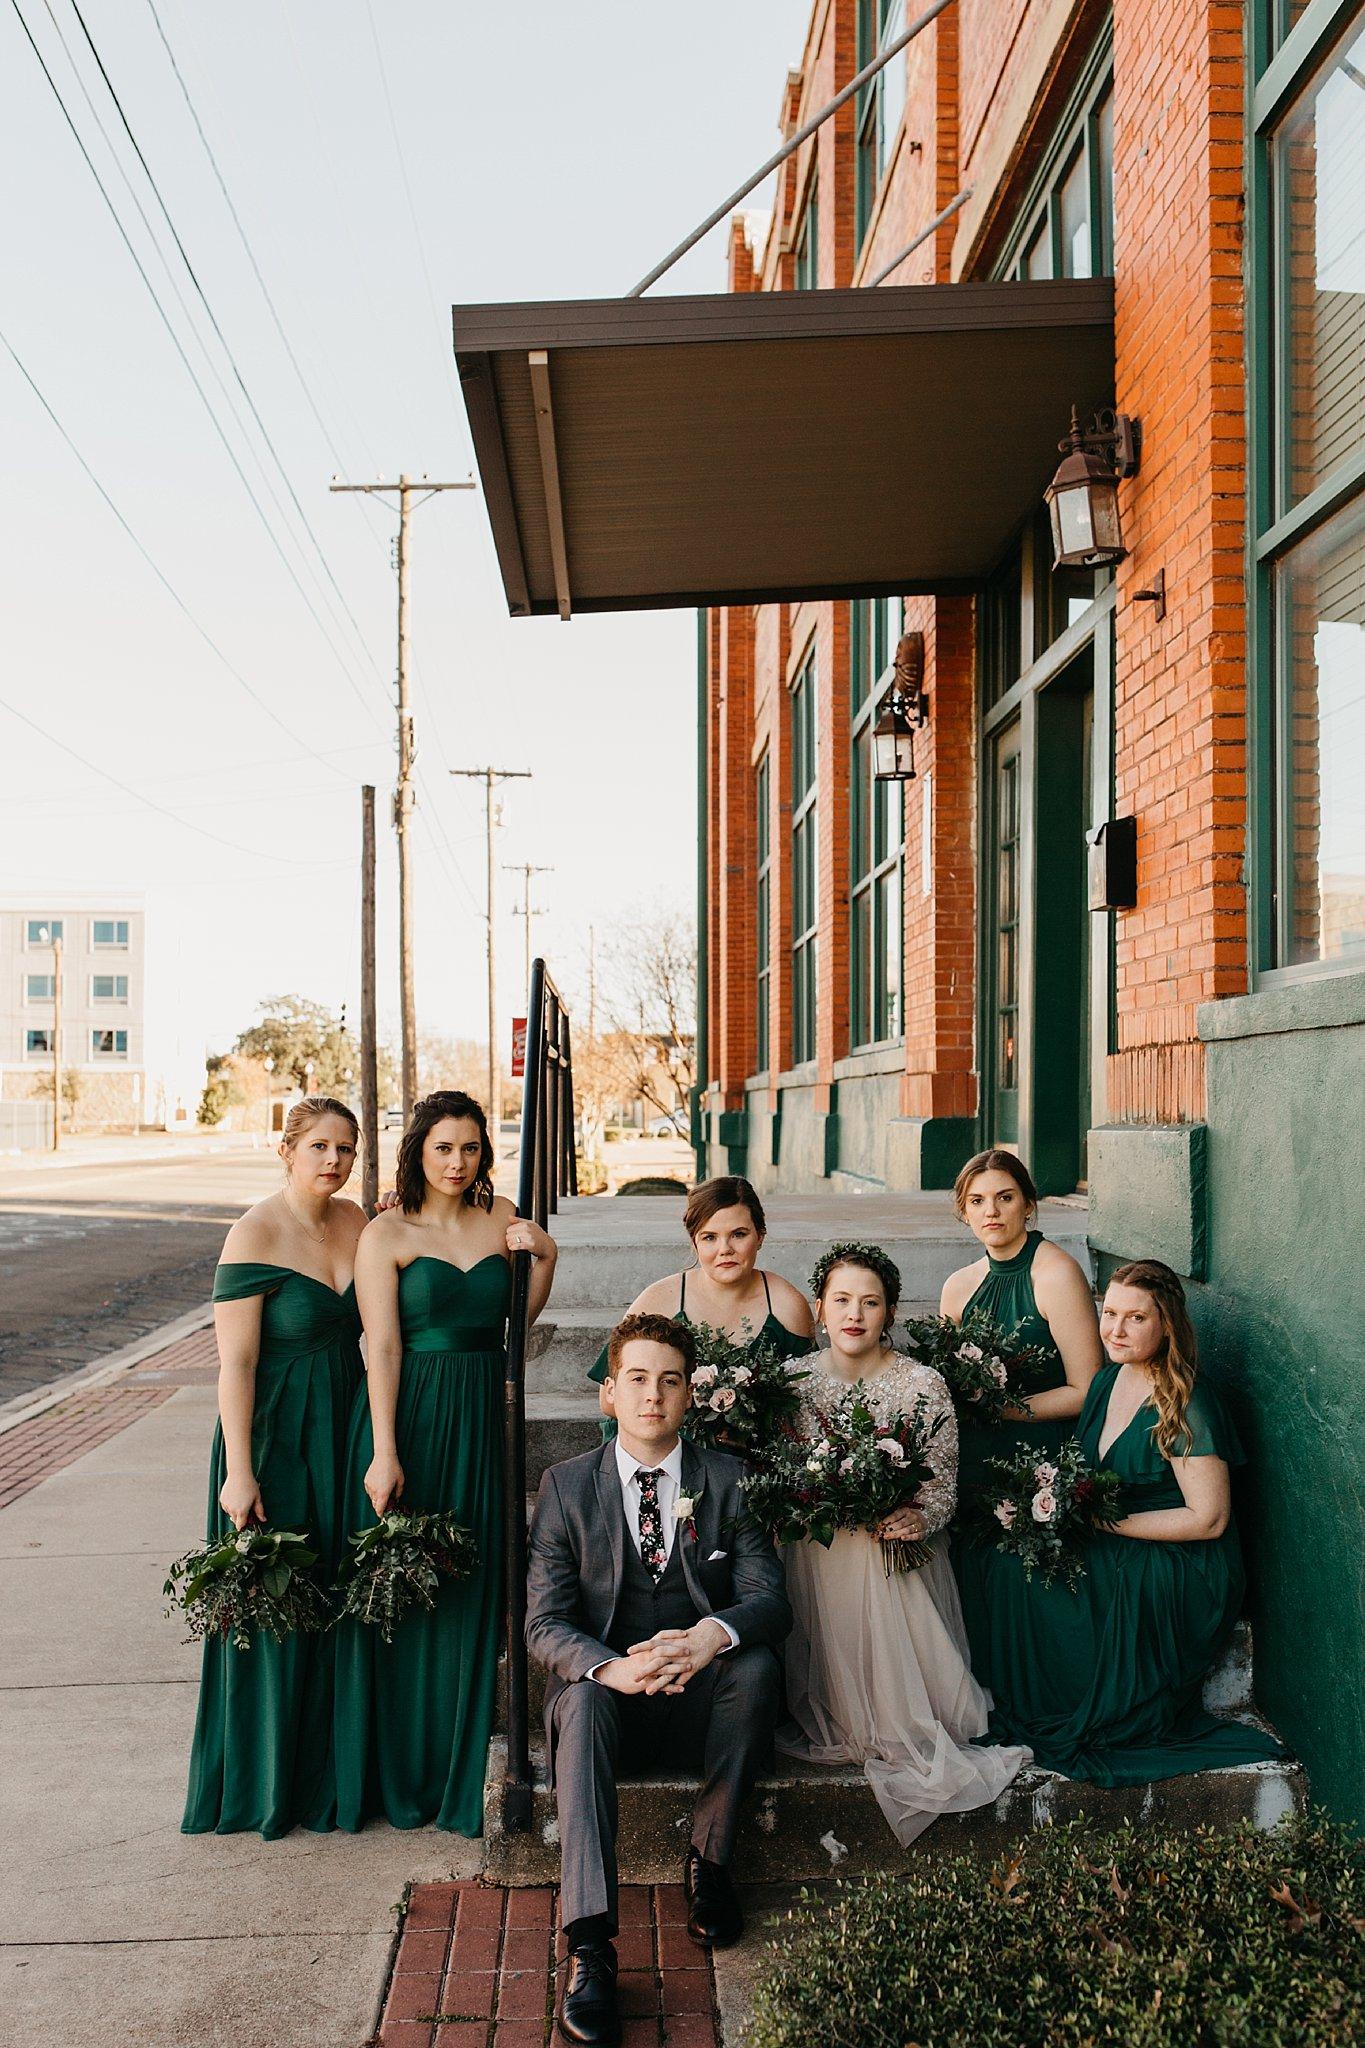 Wilderlove Co_Waco Texas_The Phoenix_Romantic Wedding Photography_0043.jpg